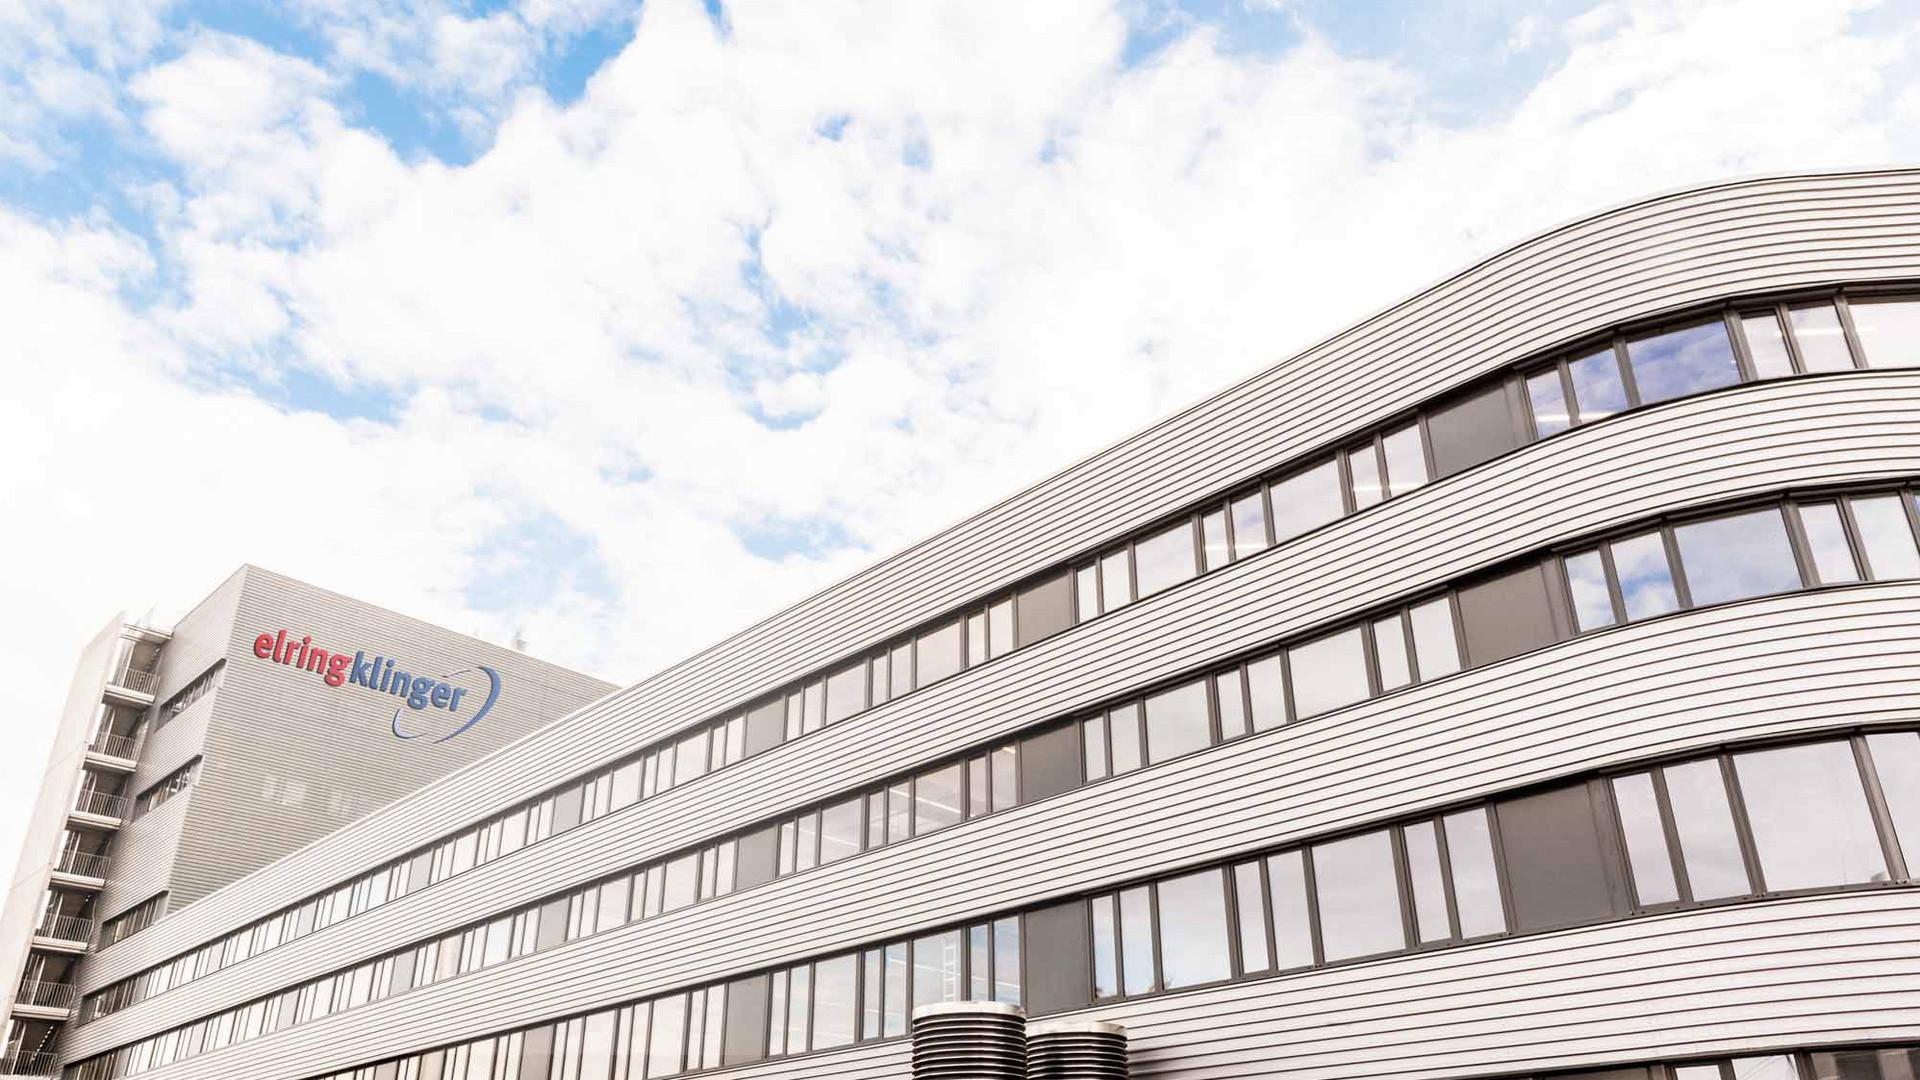 [Translate to Japanisch - 日本人:] ElringKlinger Kunststofftechnik GmbH Bietigheim-Bissingen new production building